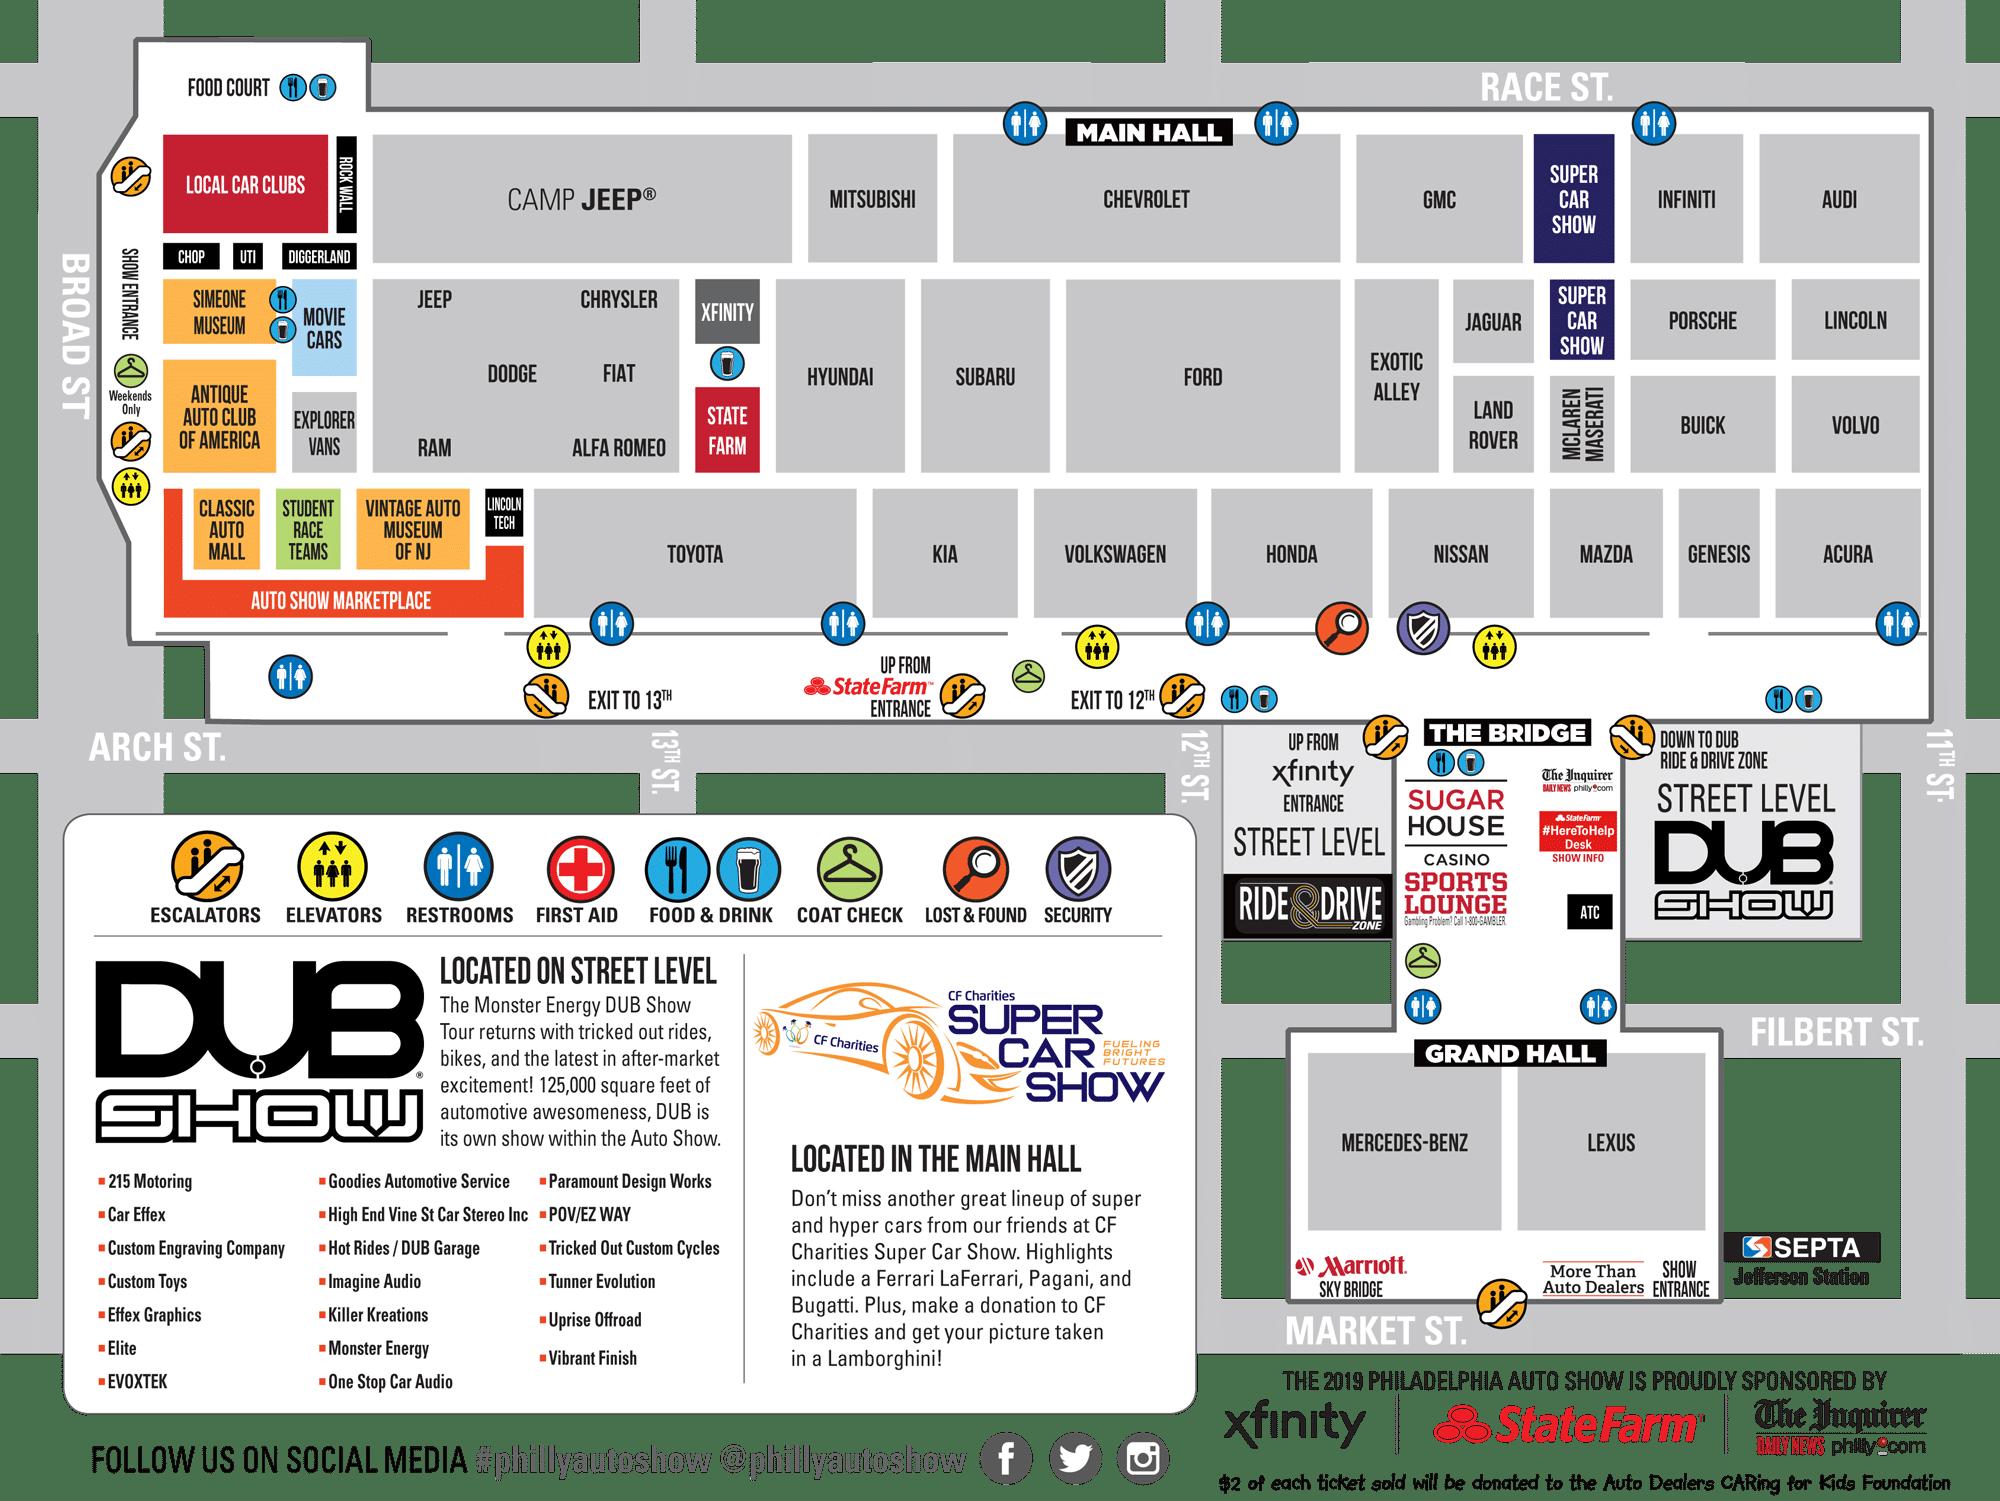 2019 Auto Show Map 6abc Philadelphia